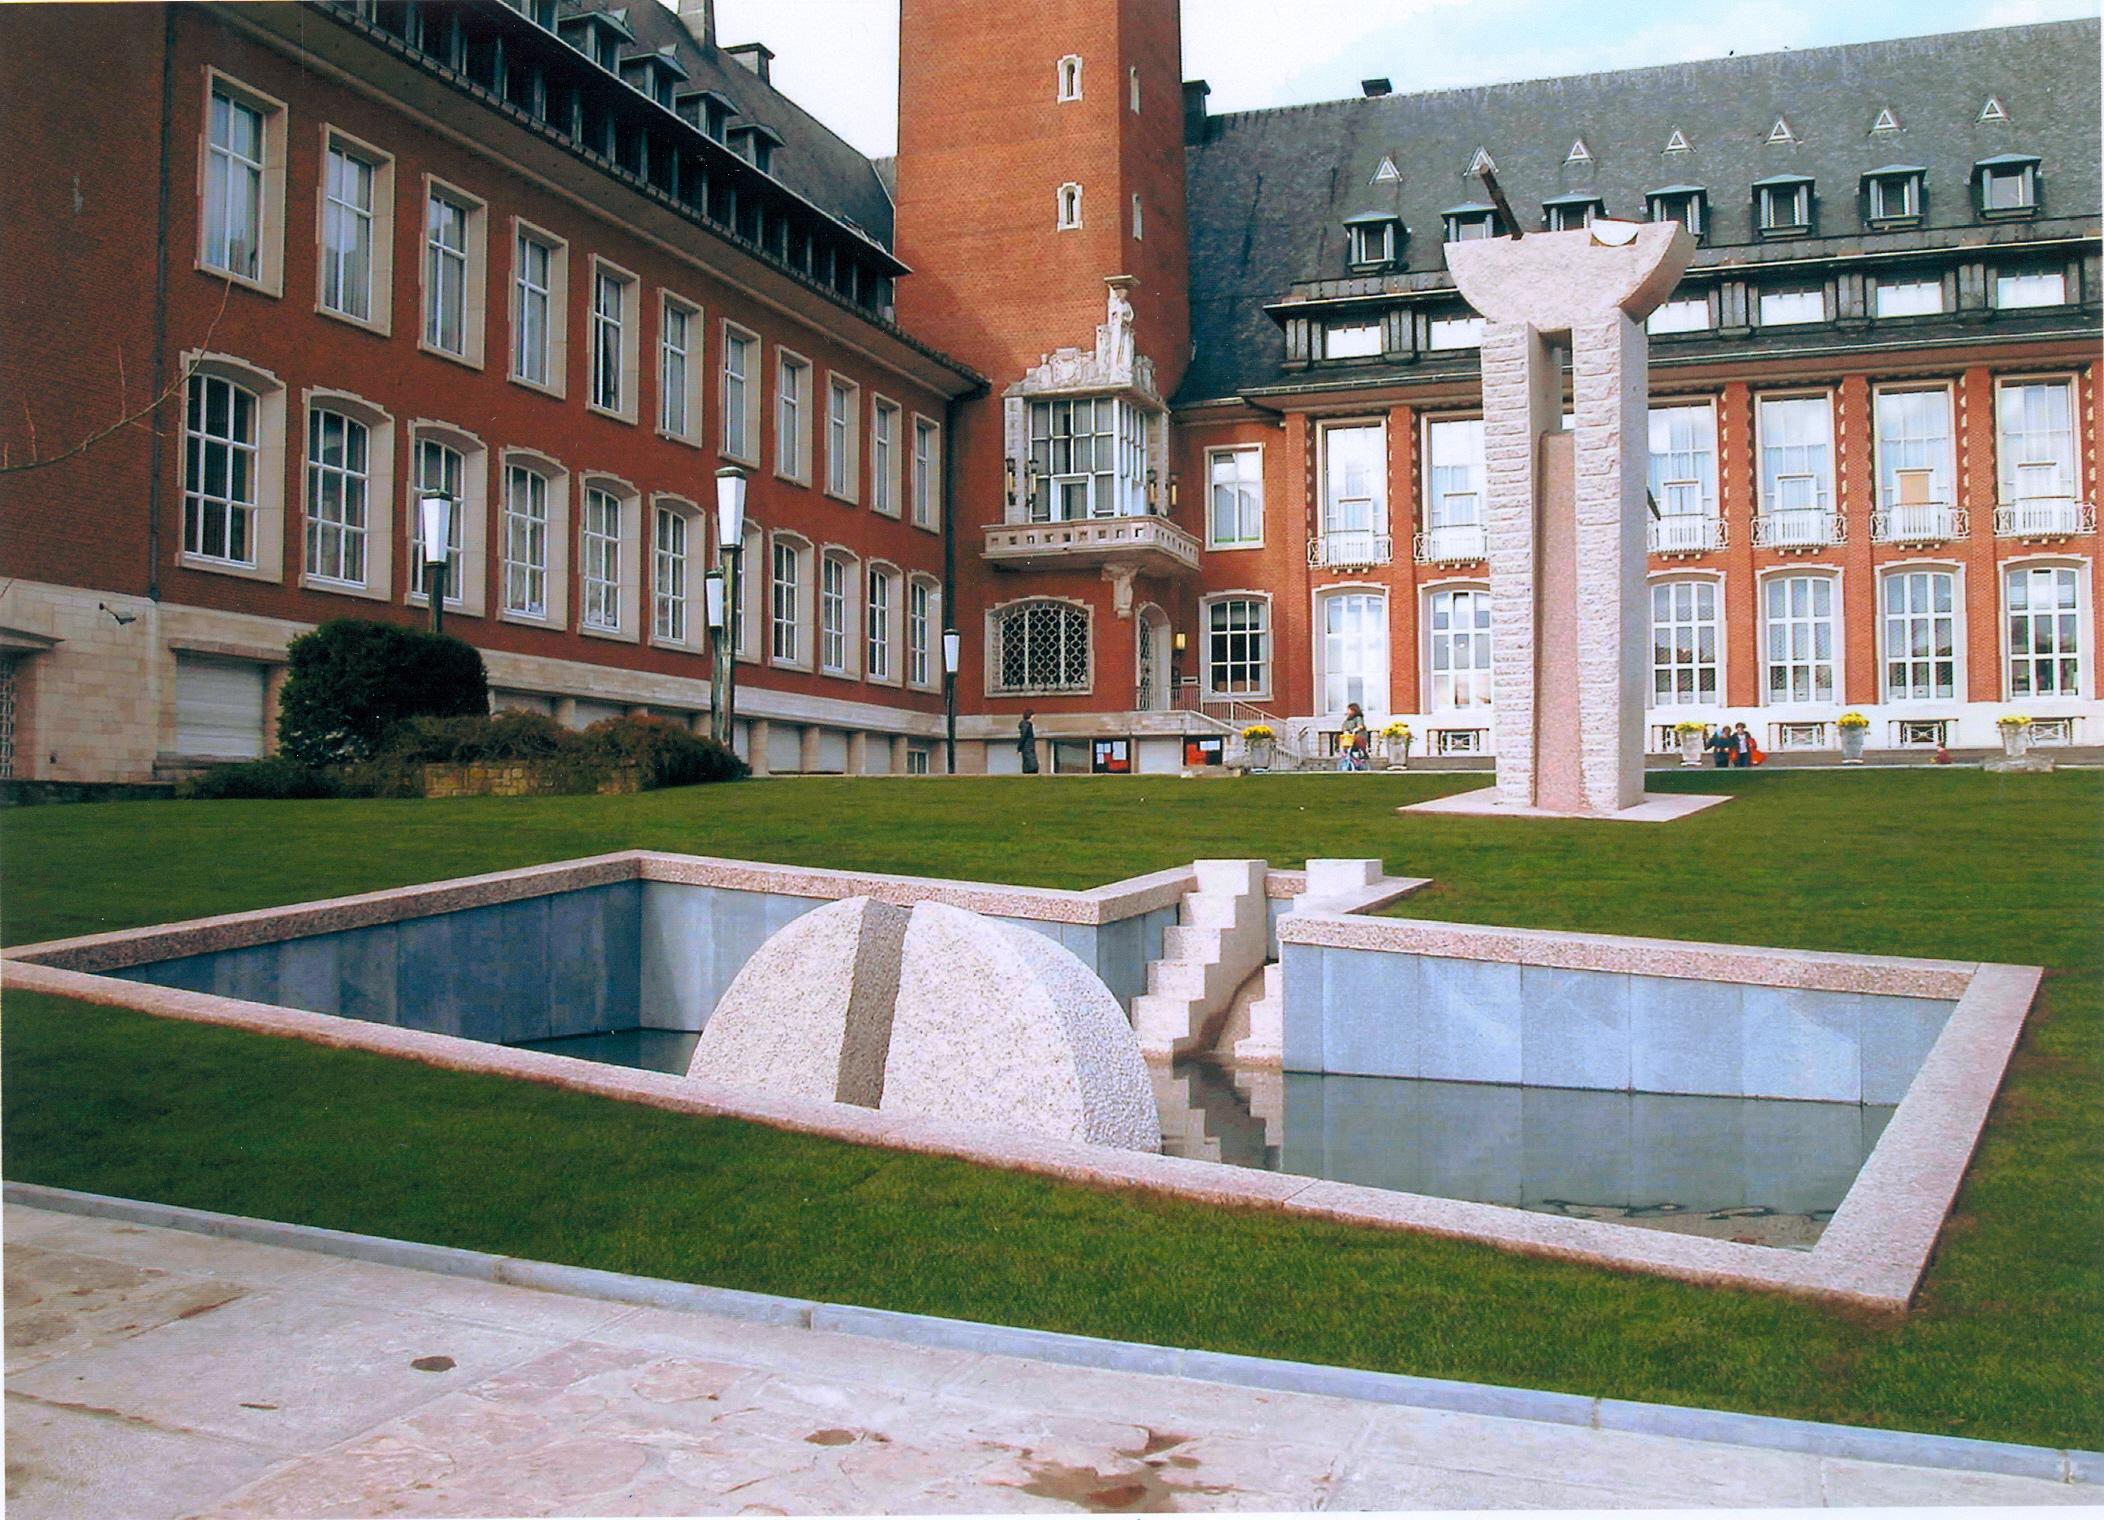 © Administration communale de Woluwe-Saint-Pierre (Guy Ambert), 2002